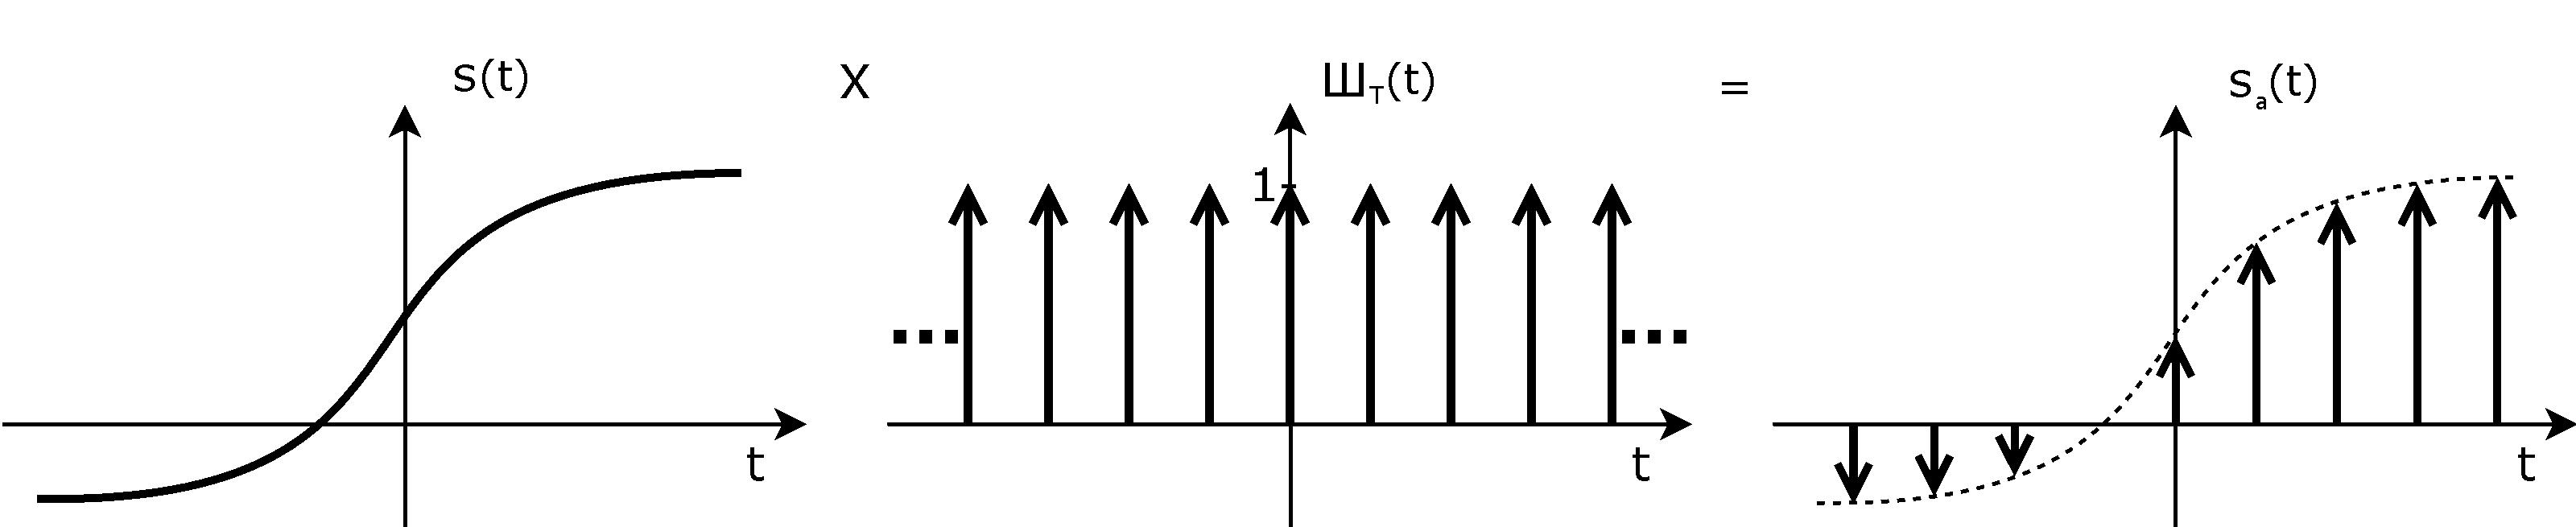 nyquist shannon sampling theorem pdf